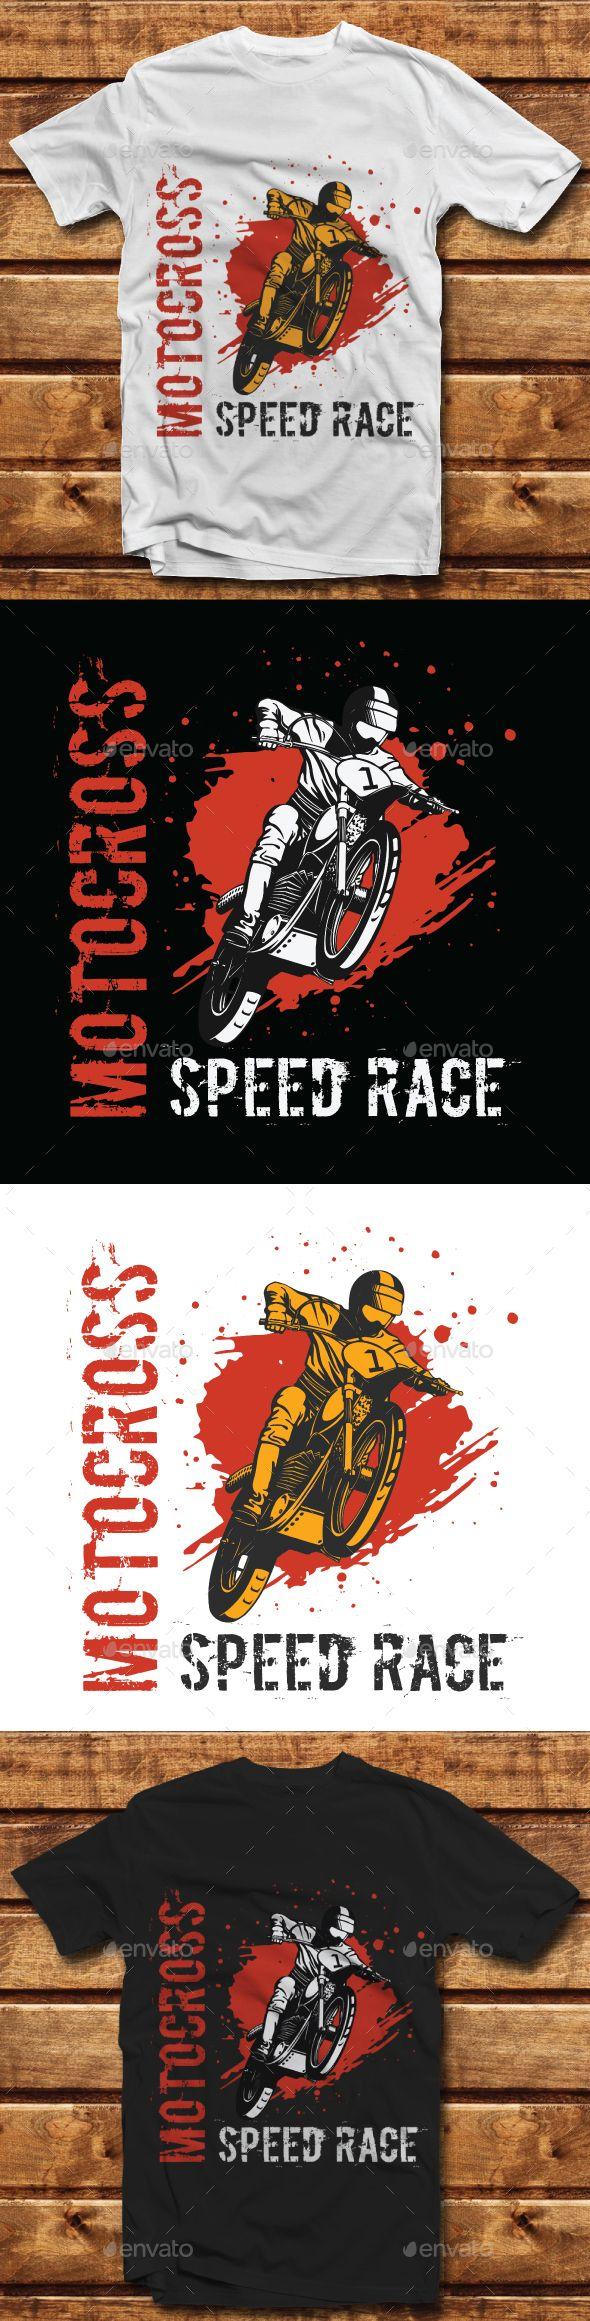 Design t shirt motocross - Buy Motocross Speed Race Tshirt Design By Imanvector On Graphicriver